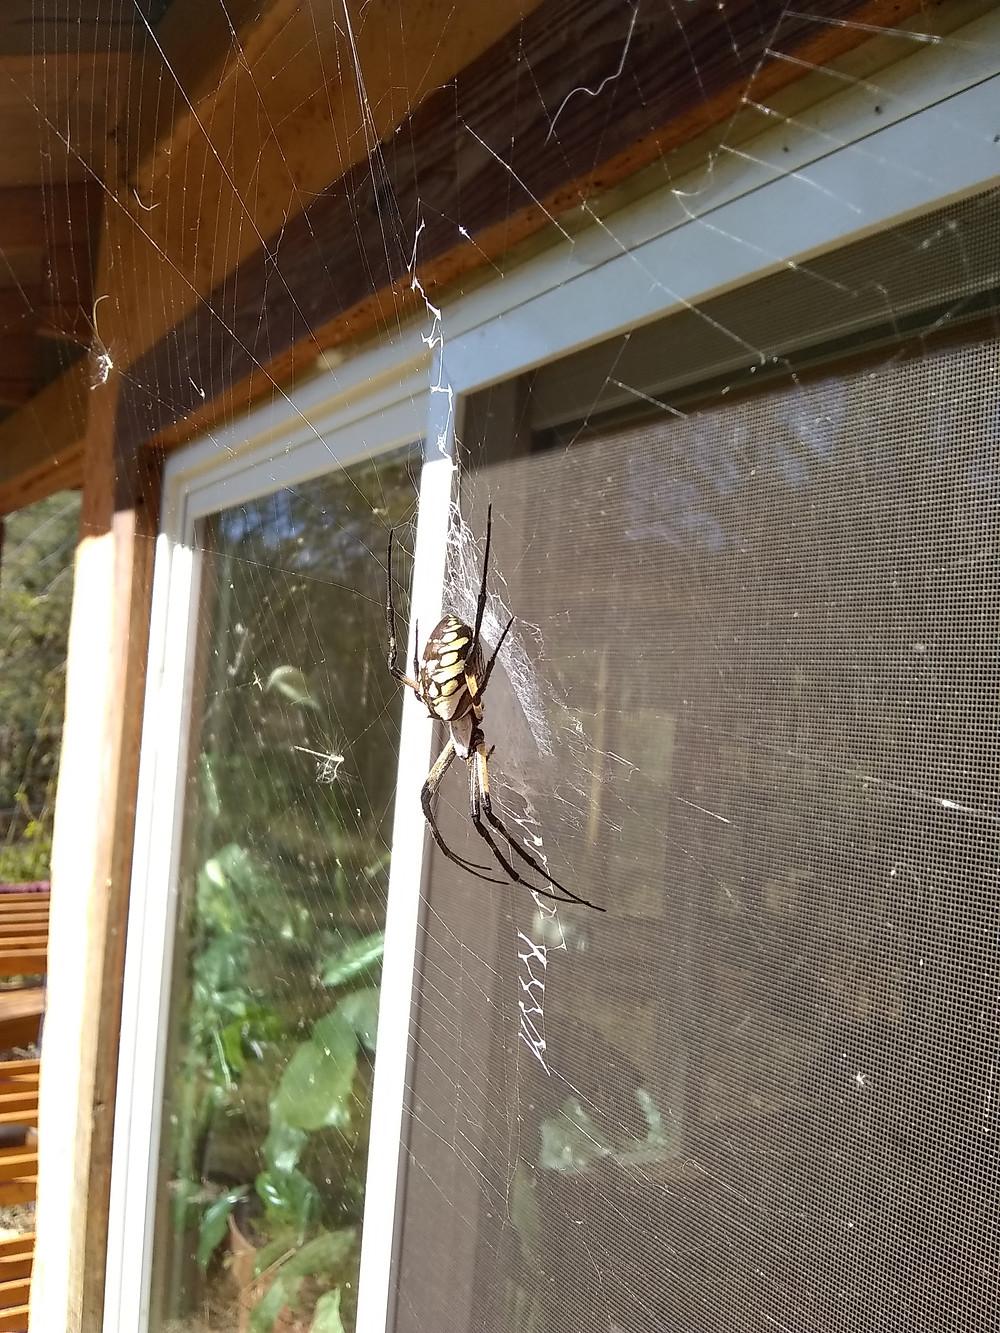 A garden spider provides free pest control